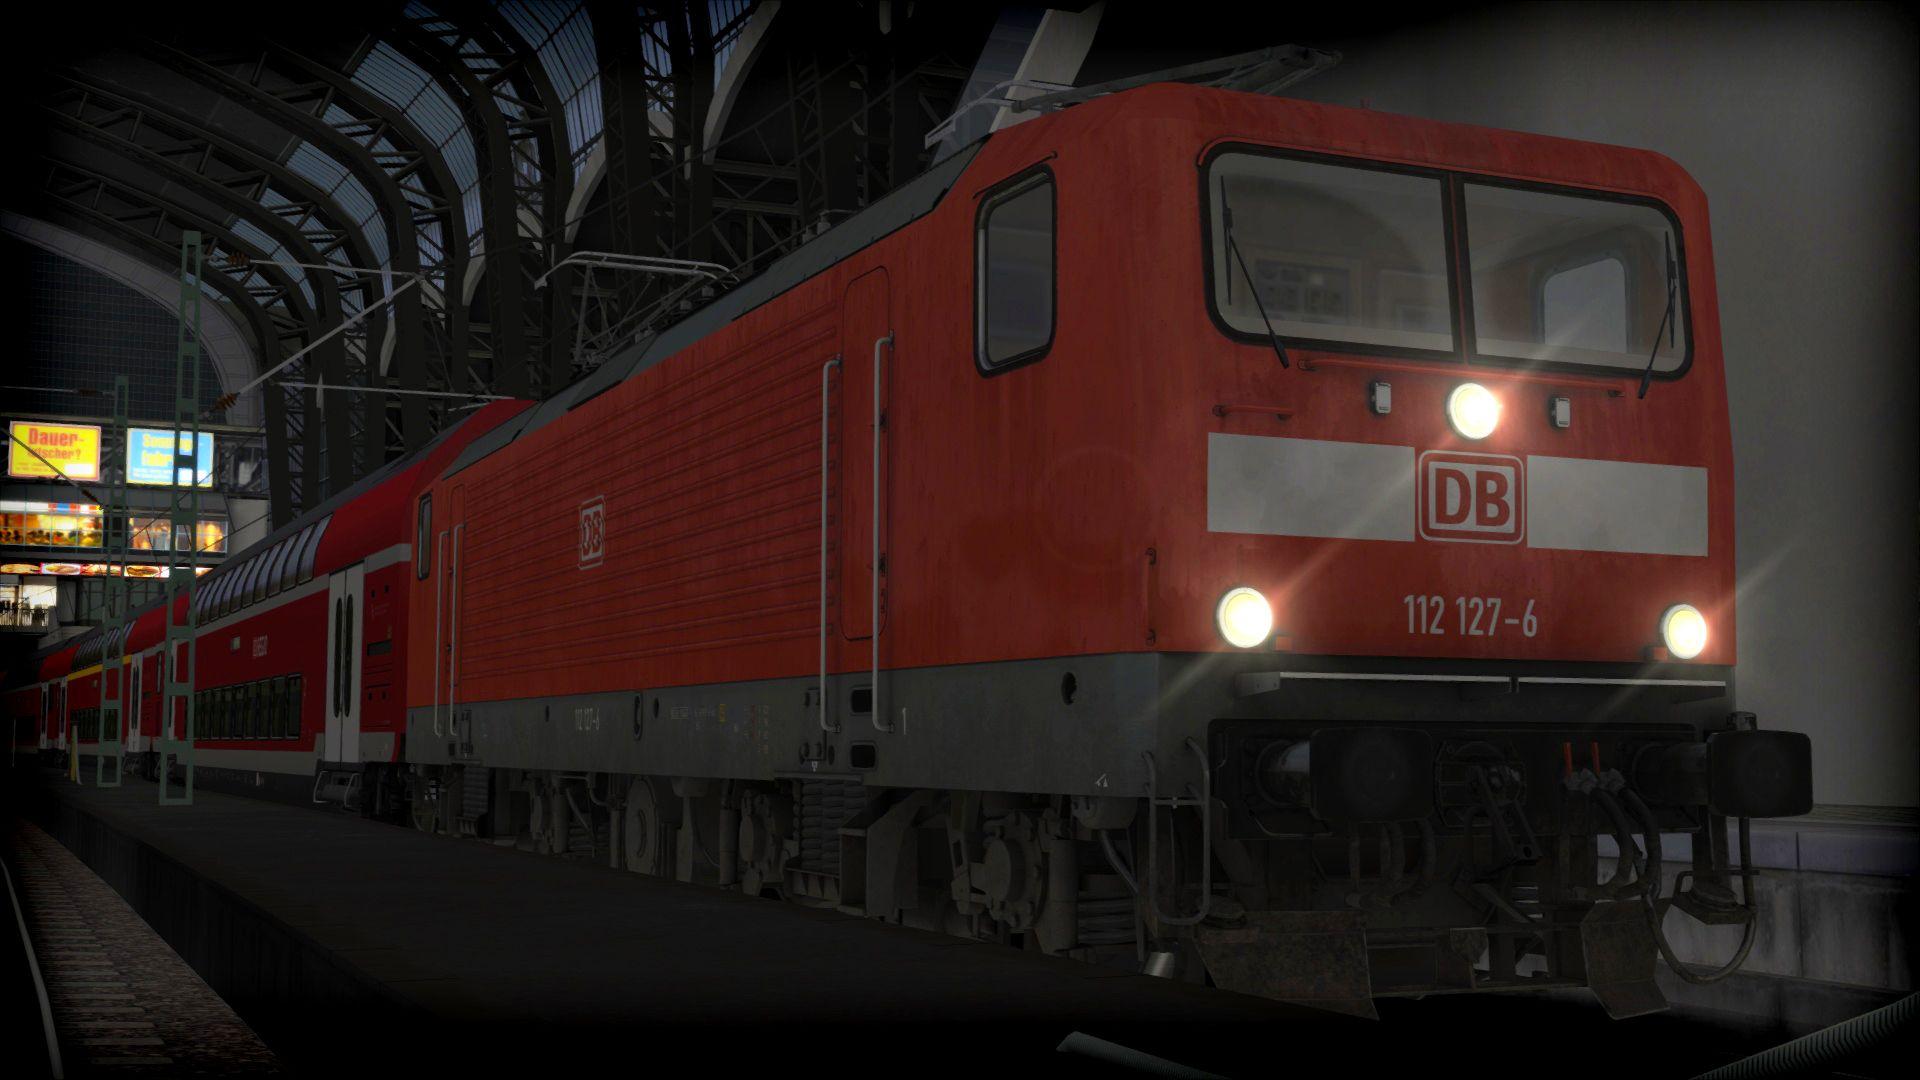 BR1122